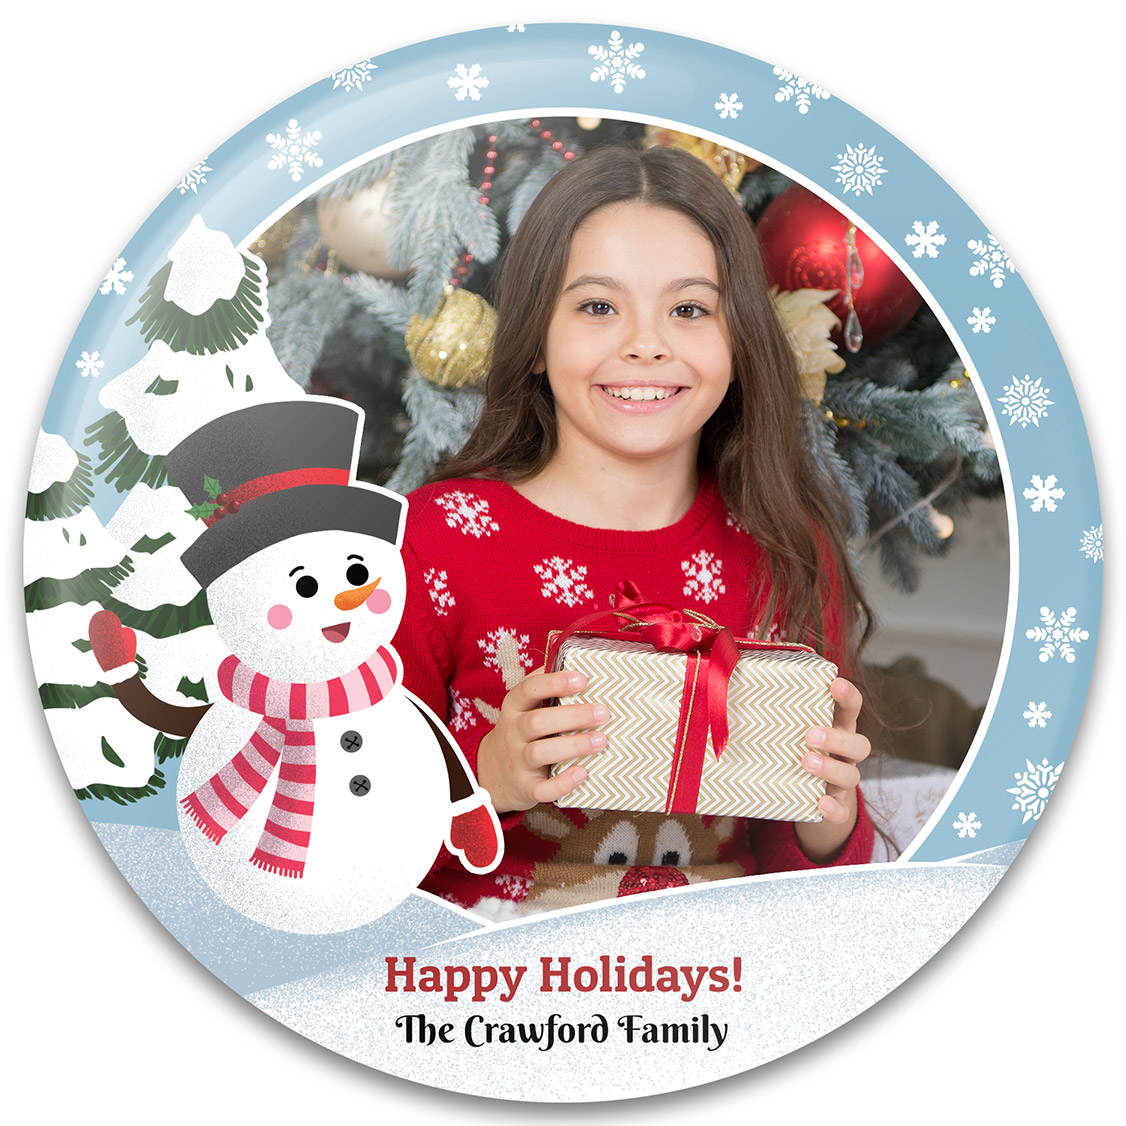 Winter Wonderland Christmas Photo Gift Template